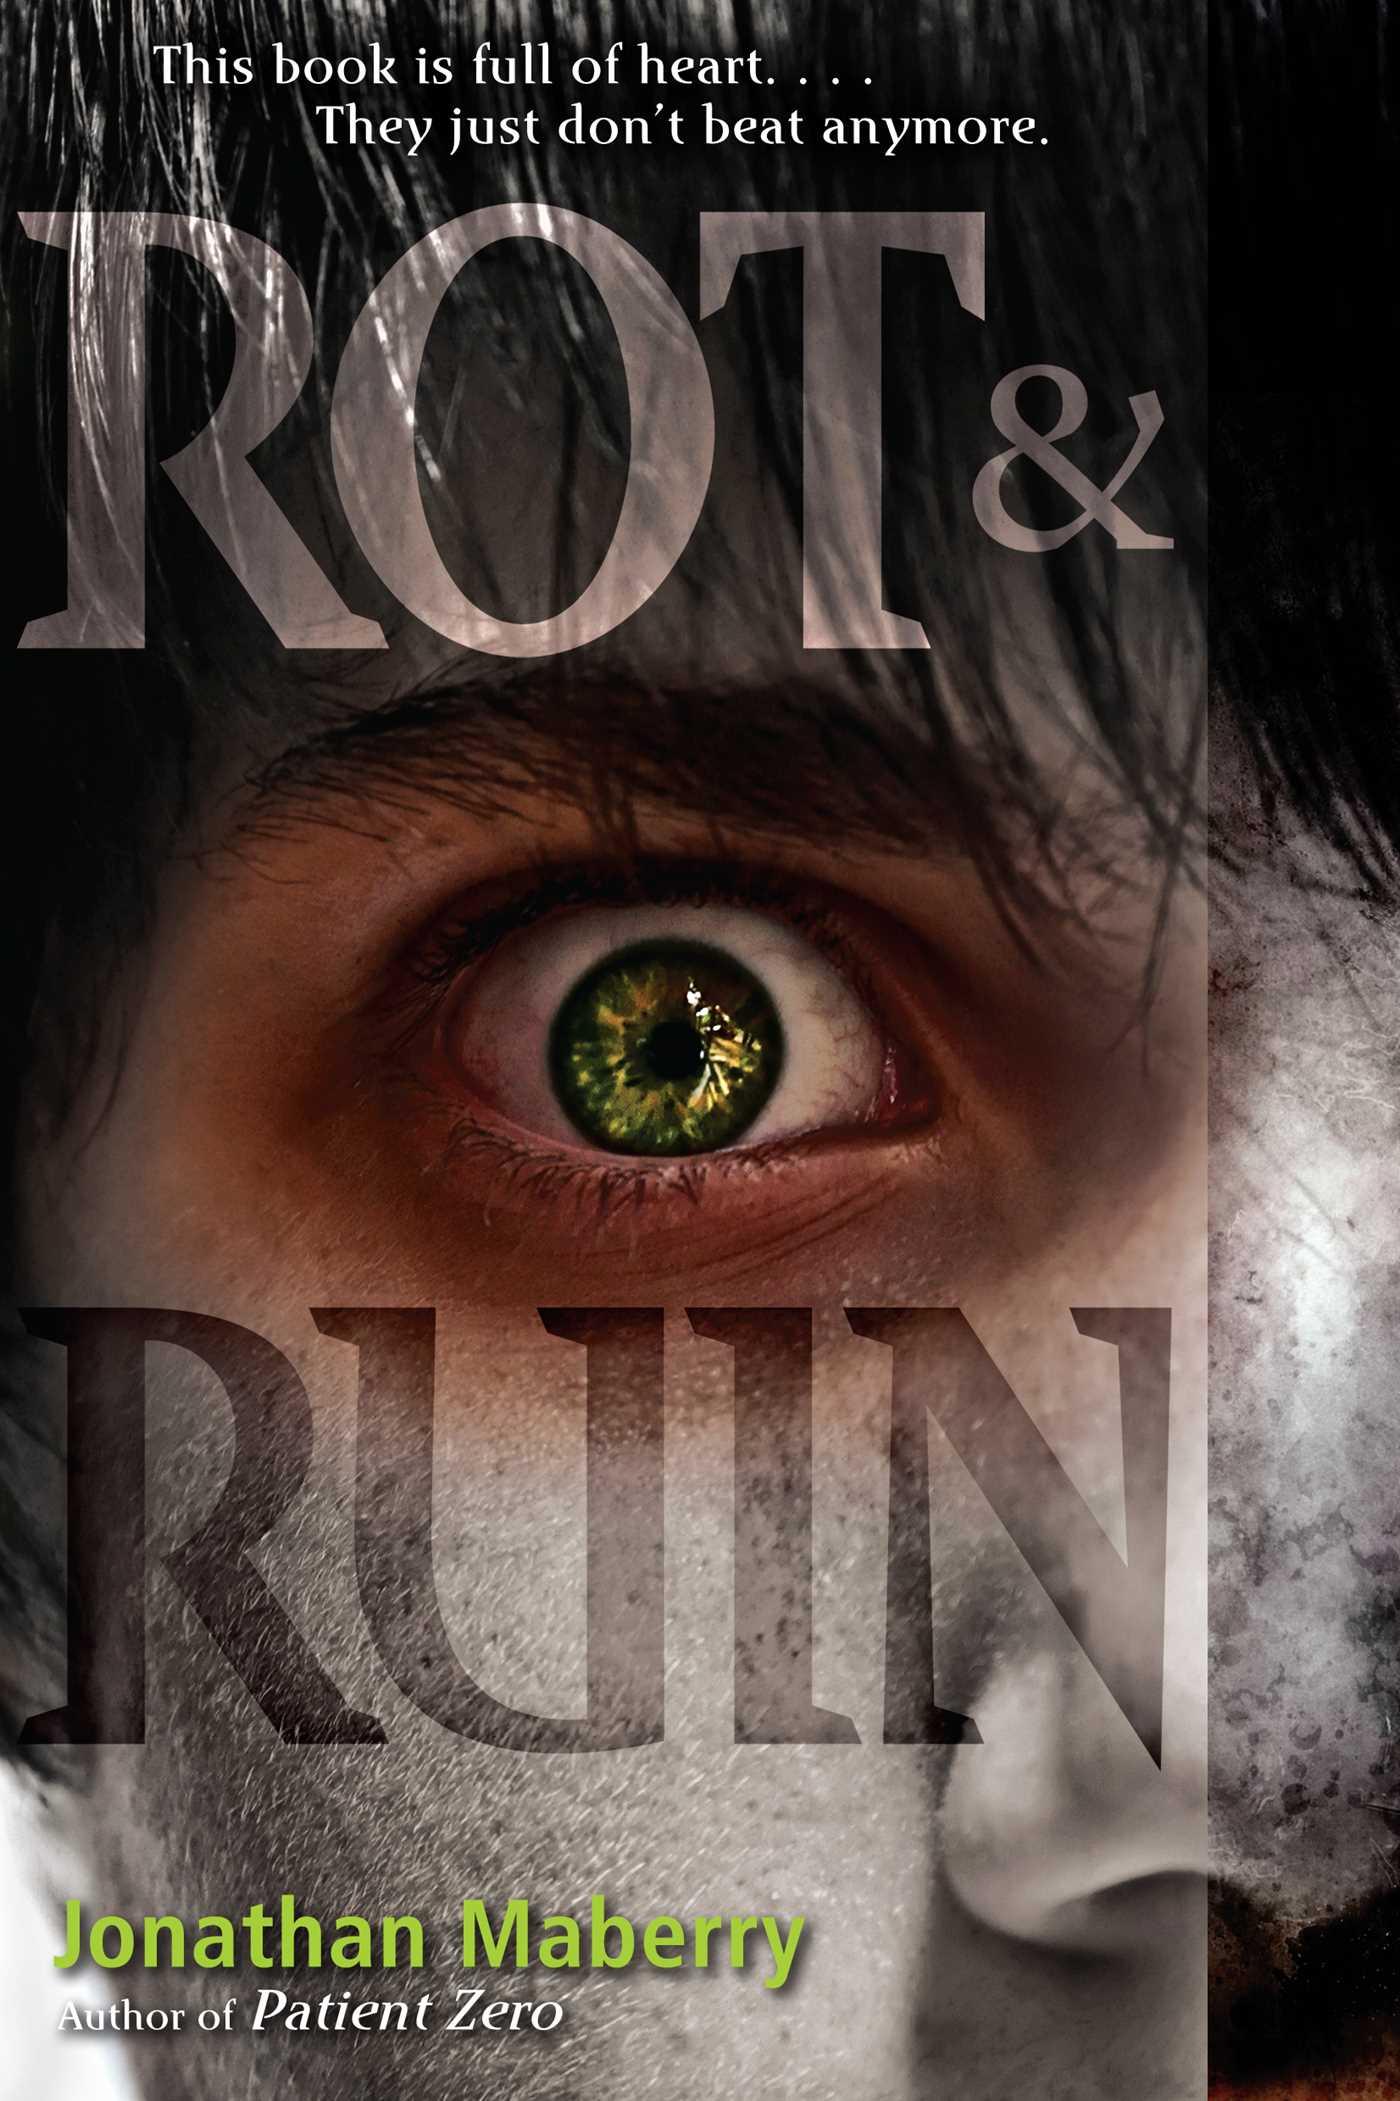 Rot ruin 9781442402348 hr